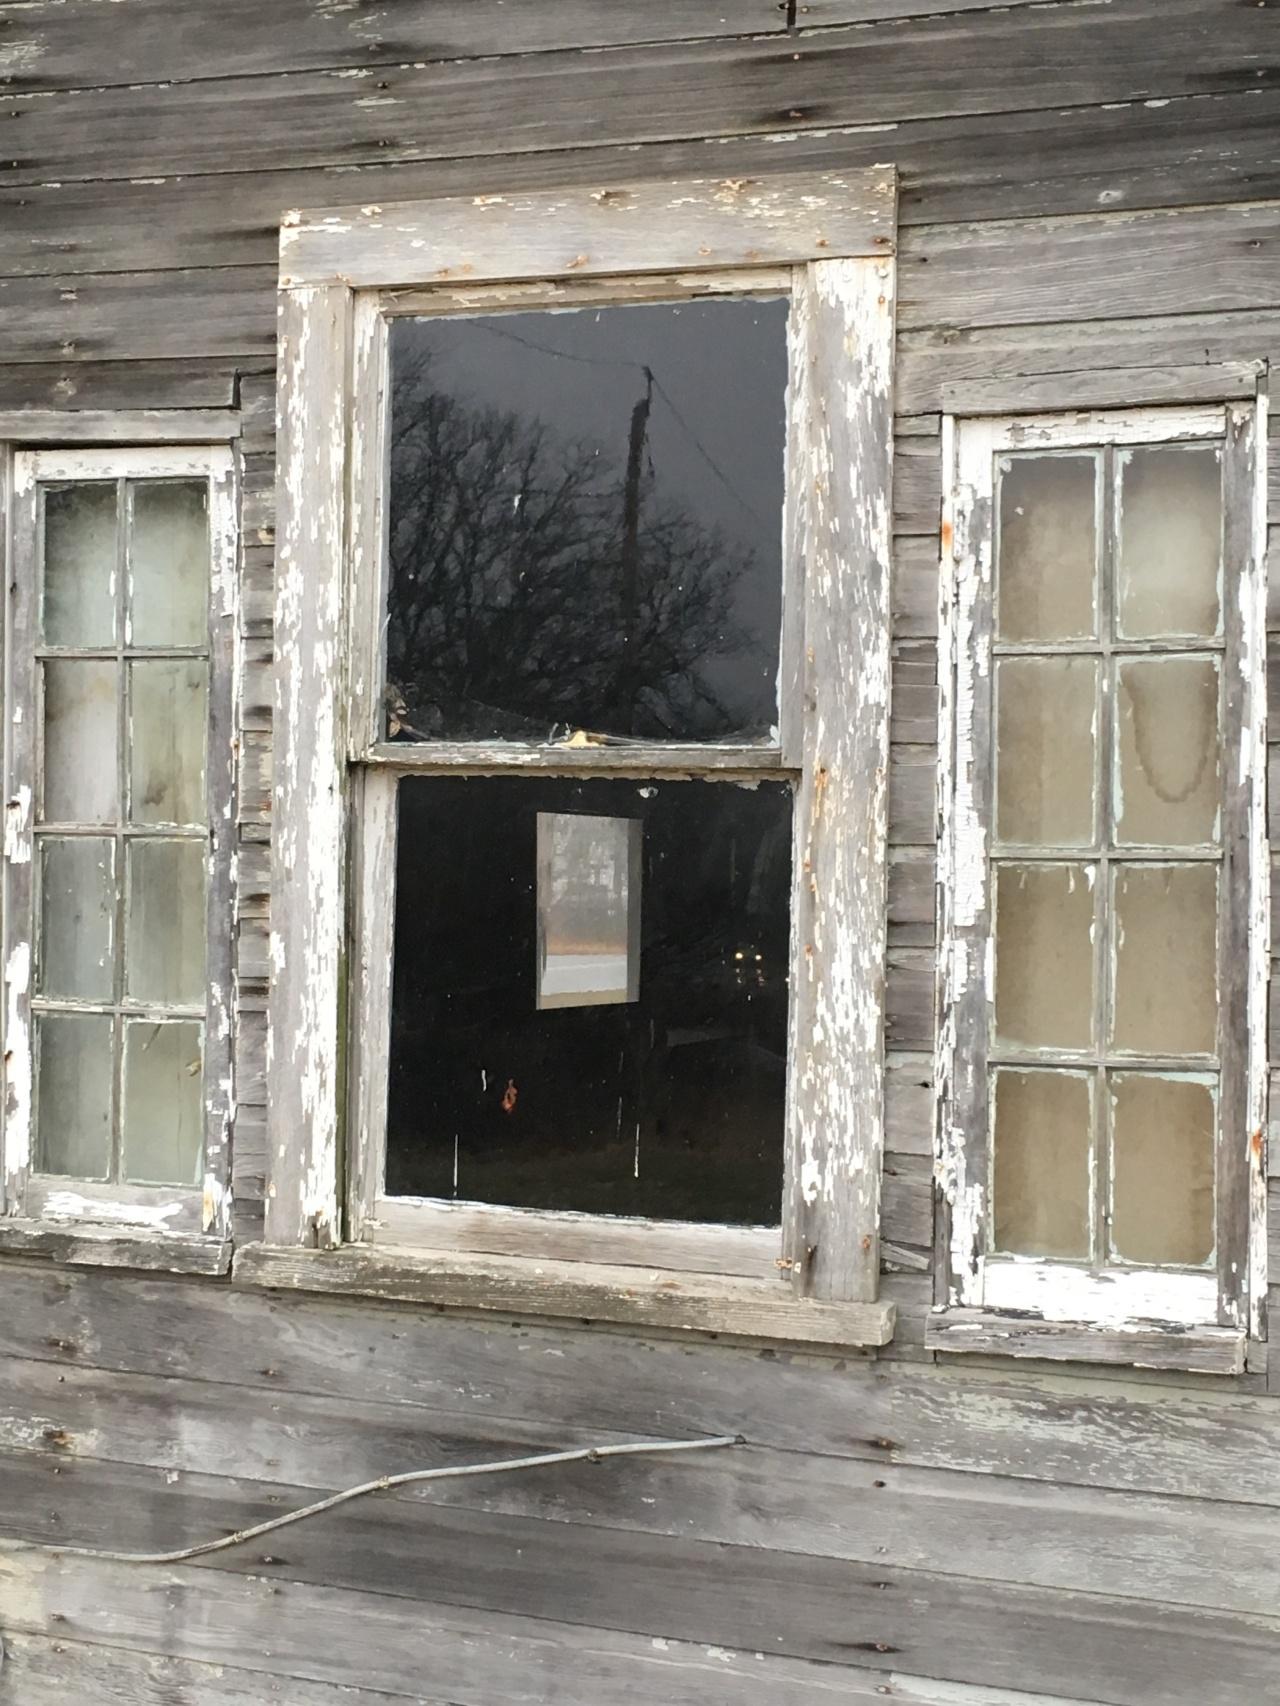 8 x 8 windows on side